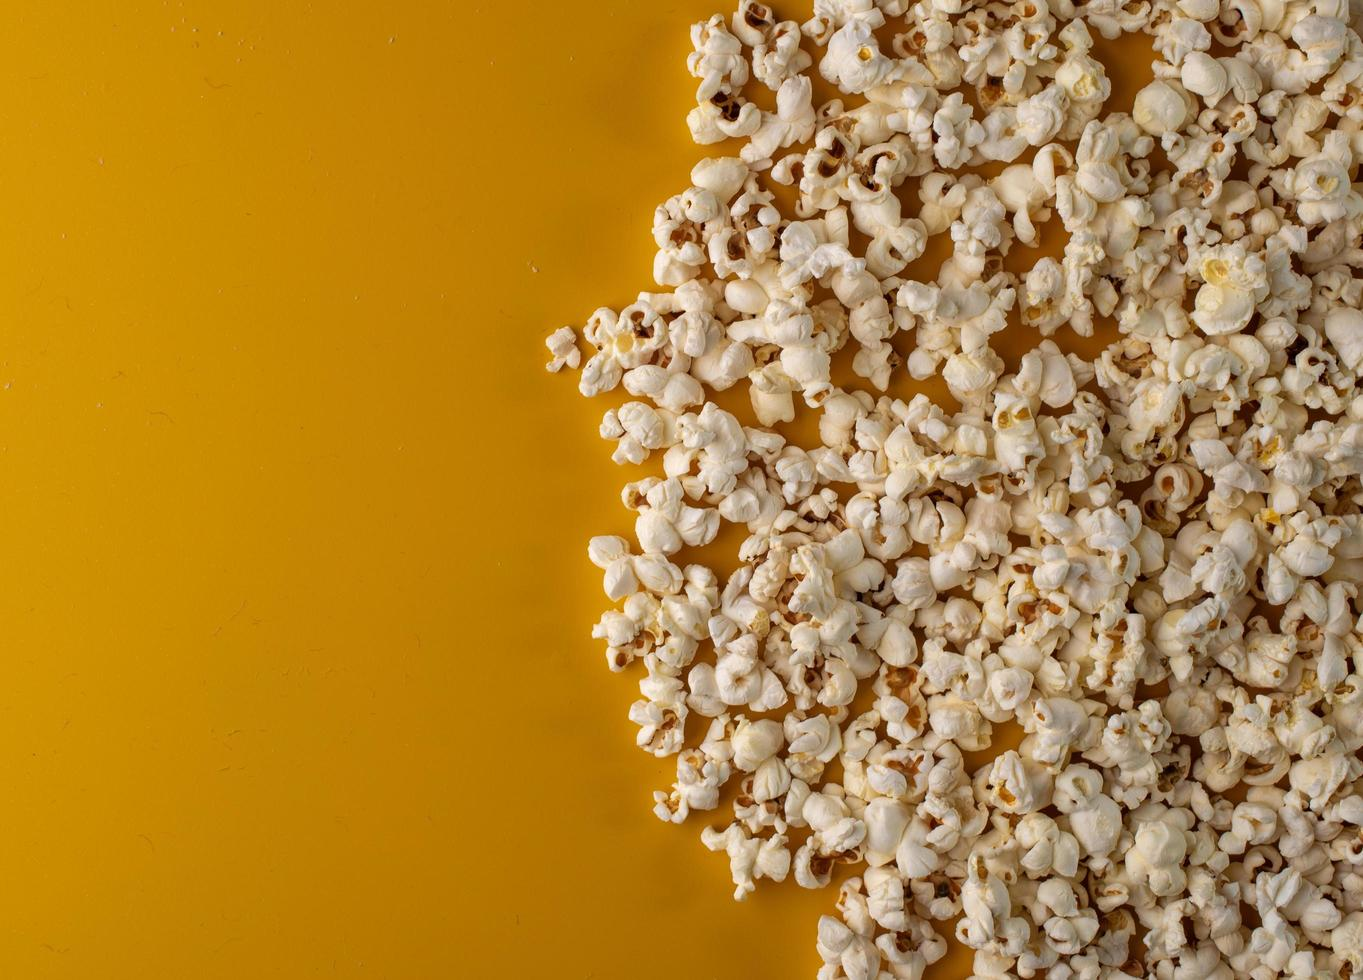 pop-corn sur fond jaune photo